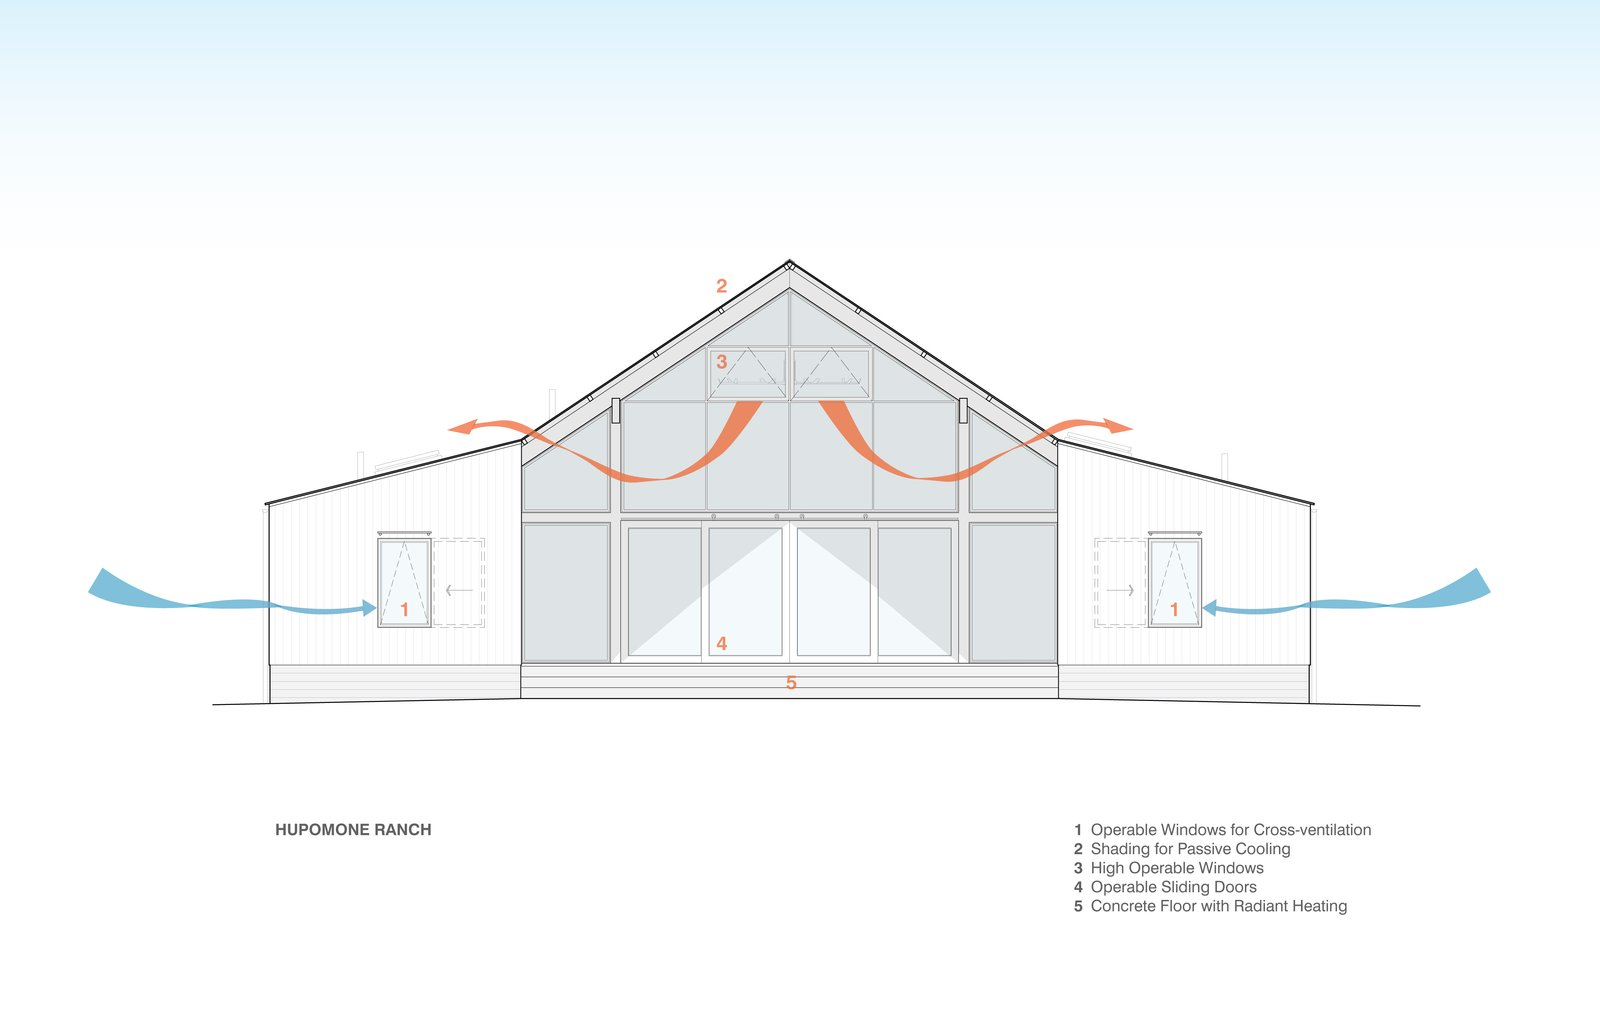 #TurnbullGriffinHaesloop  #barn  #sustainability   Hupomone Ranch by Turnbull Griffin Haesloop Architects